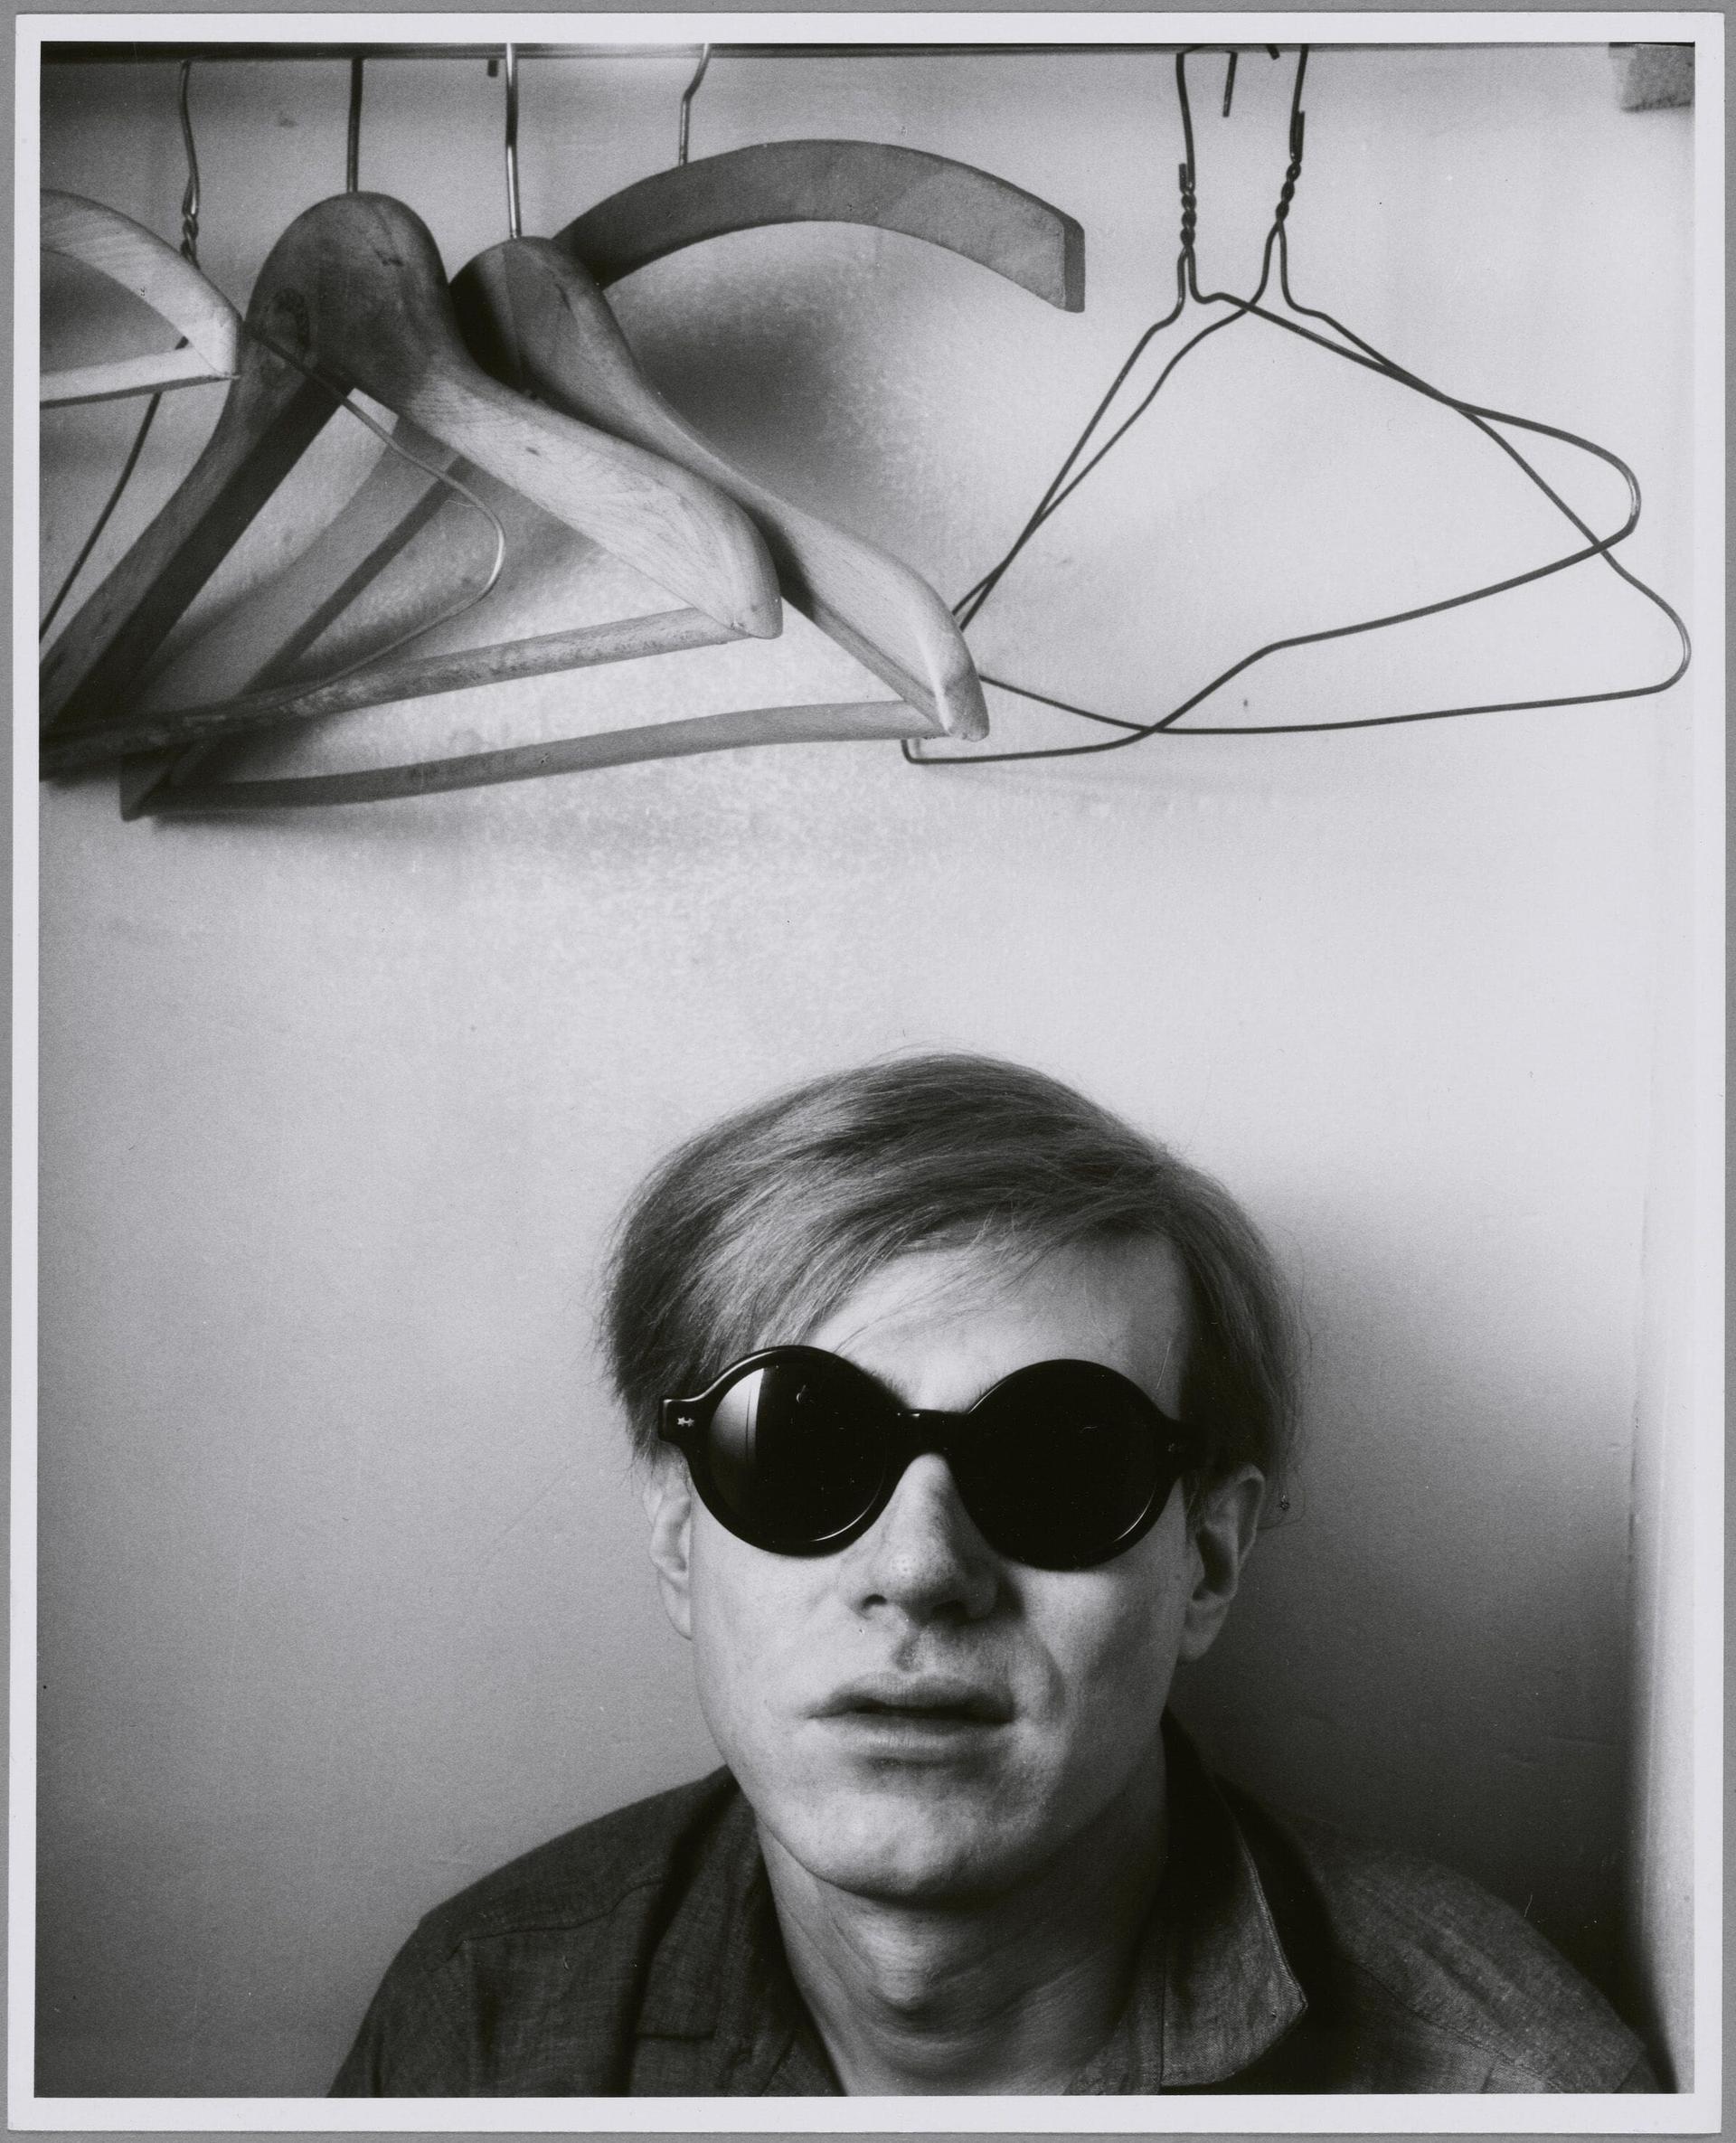 Shunk-Kender, Andy Warhol, Hôtel Royale Bison, Parigi, maggio 1965. Donazione della Roy Lichtenstein Foundation in memoria di Harry Shunk e Janos Kender. Foto: Shunk-Kender © J. Paul Getty Trust. Tutti i diritti riservati.